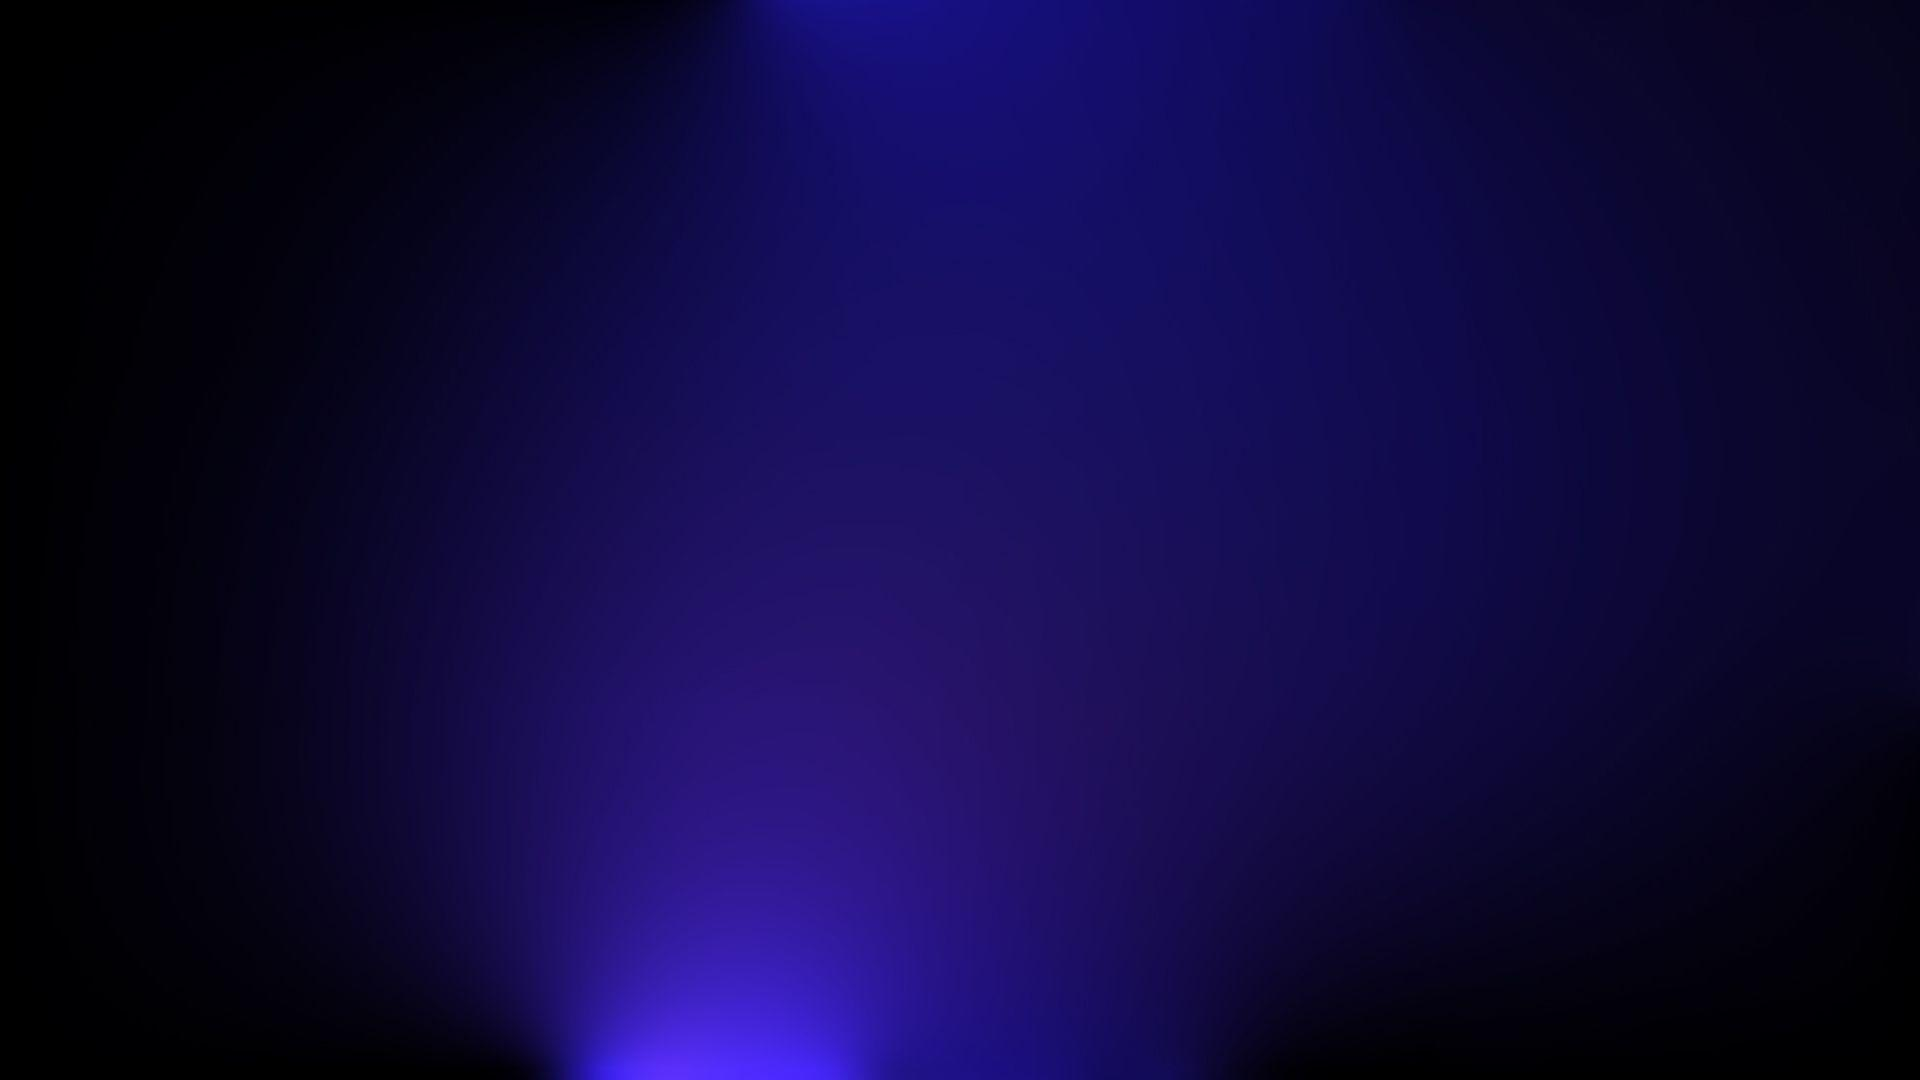 hd-wallpapers-dark-blue-wallpaper-lime-green-1920x1080-